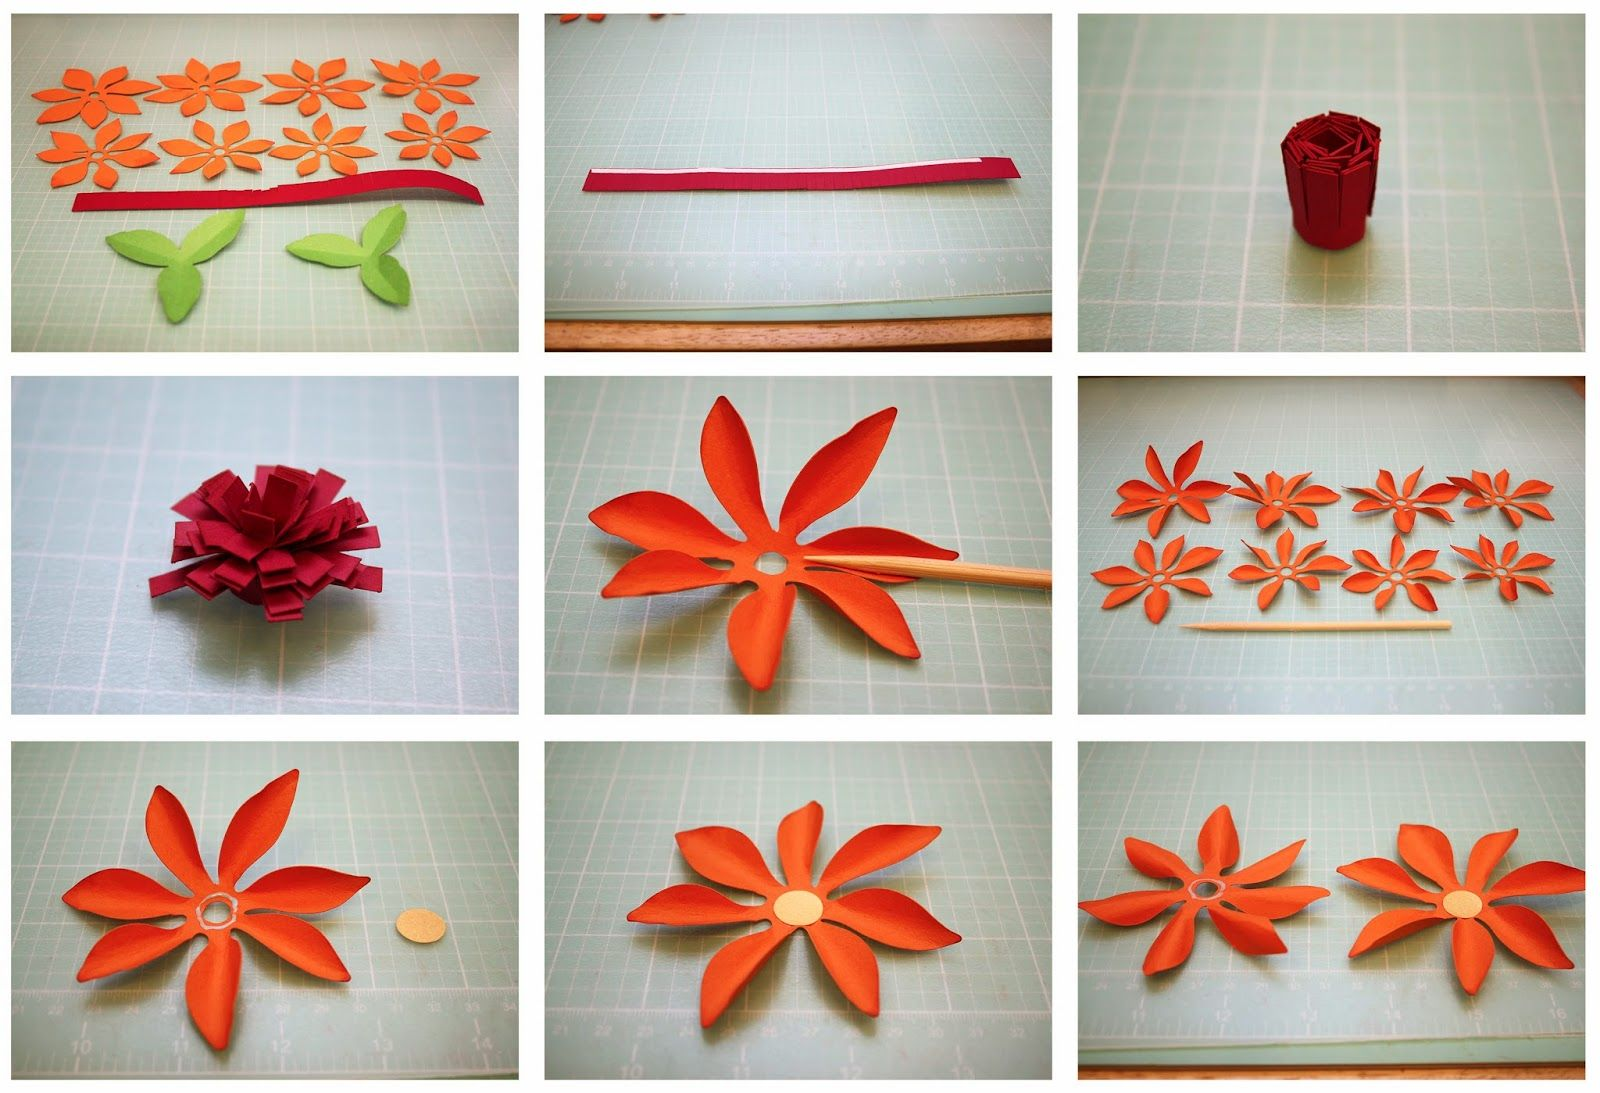 Bits Of Paper Mum 3d Paper Flowers All About Quilling Technique